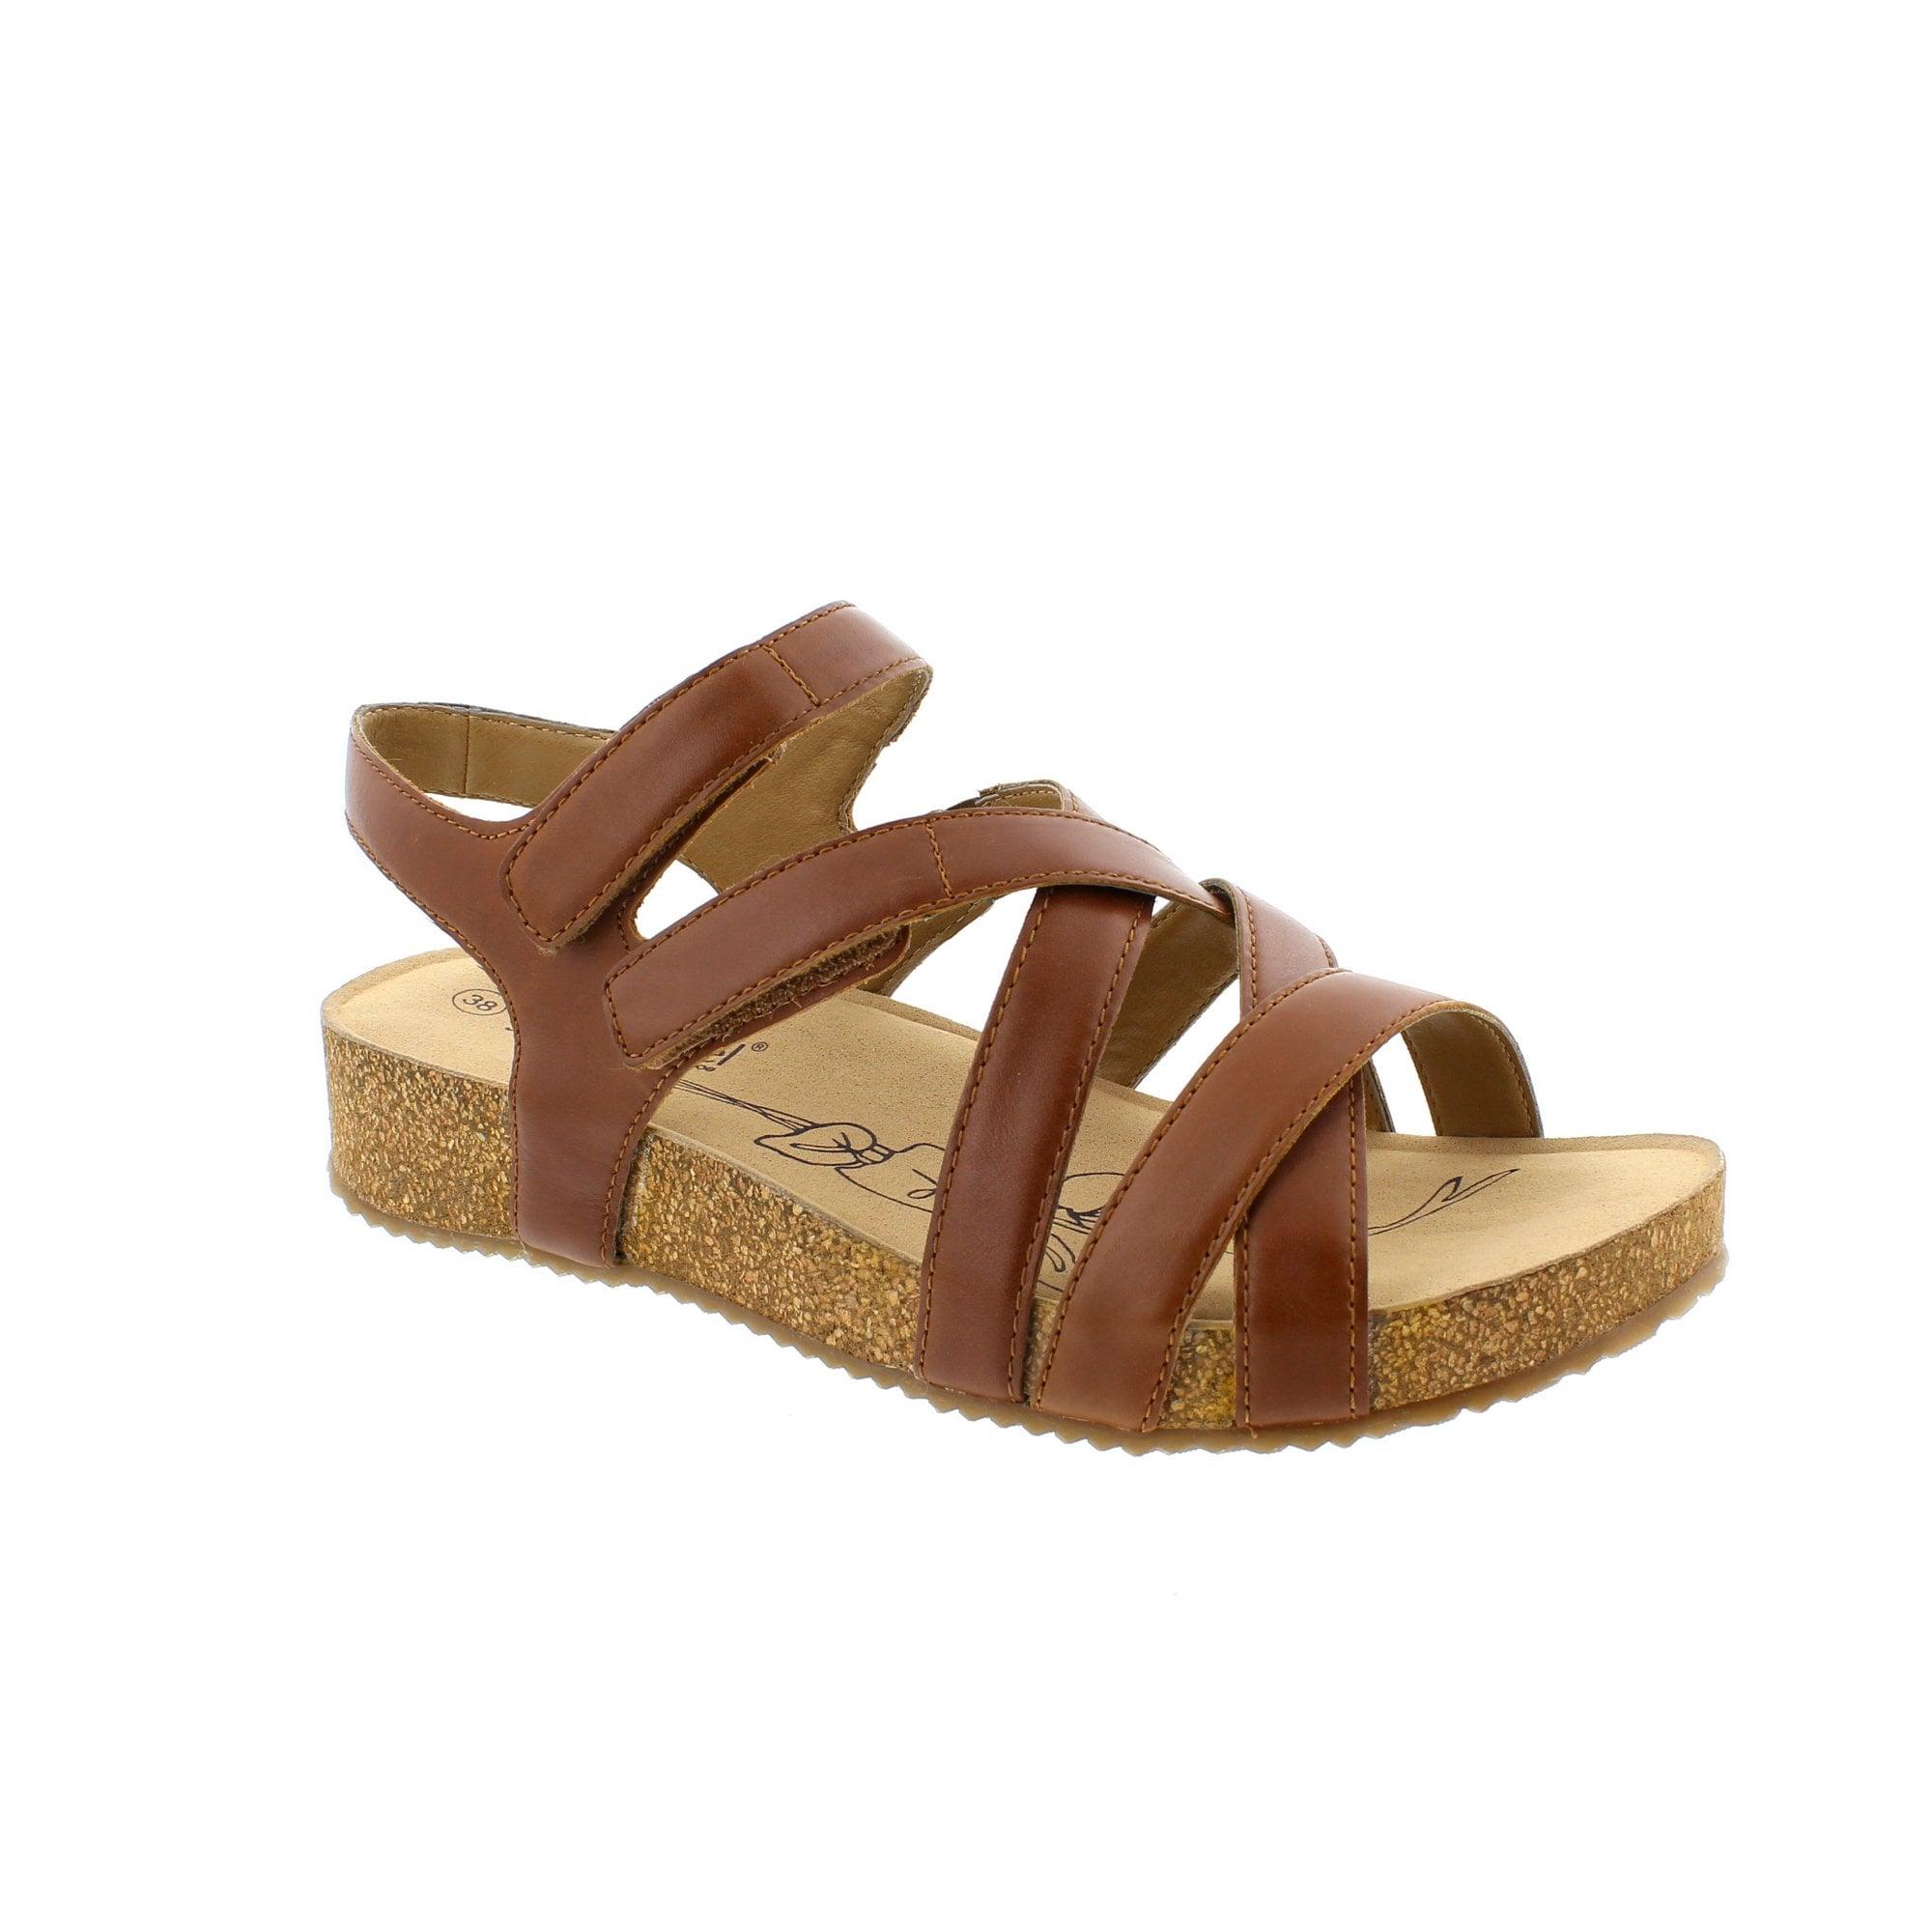 Josef Seibel Tonga 37 78537-69240 Womens Sandals 103dbfa7e0